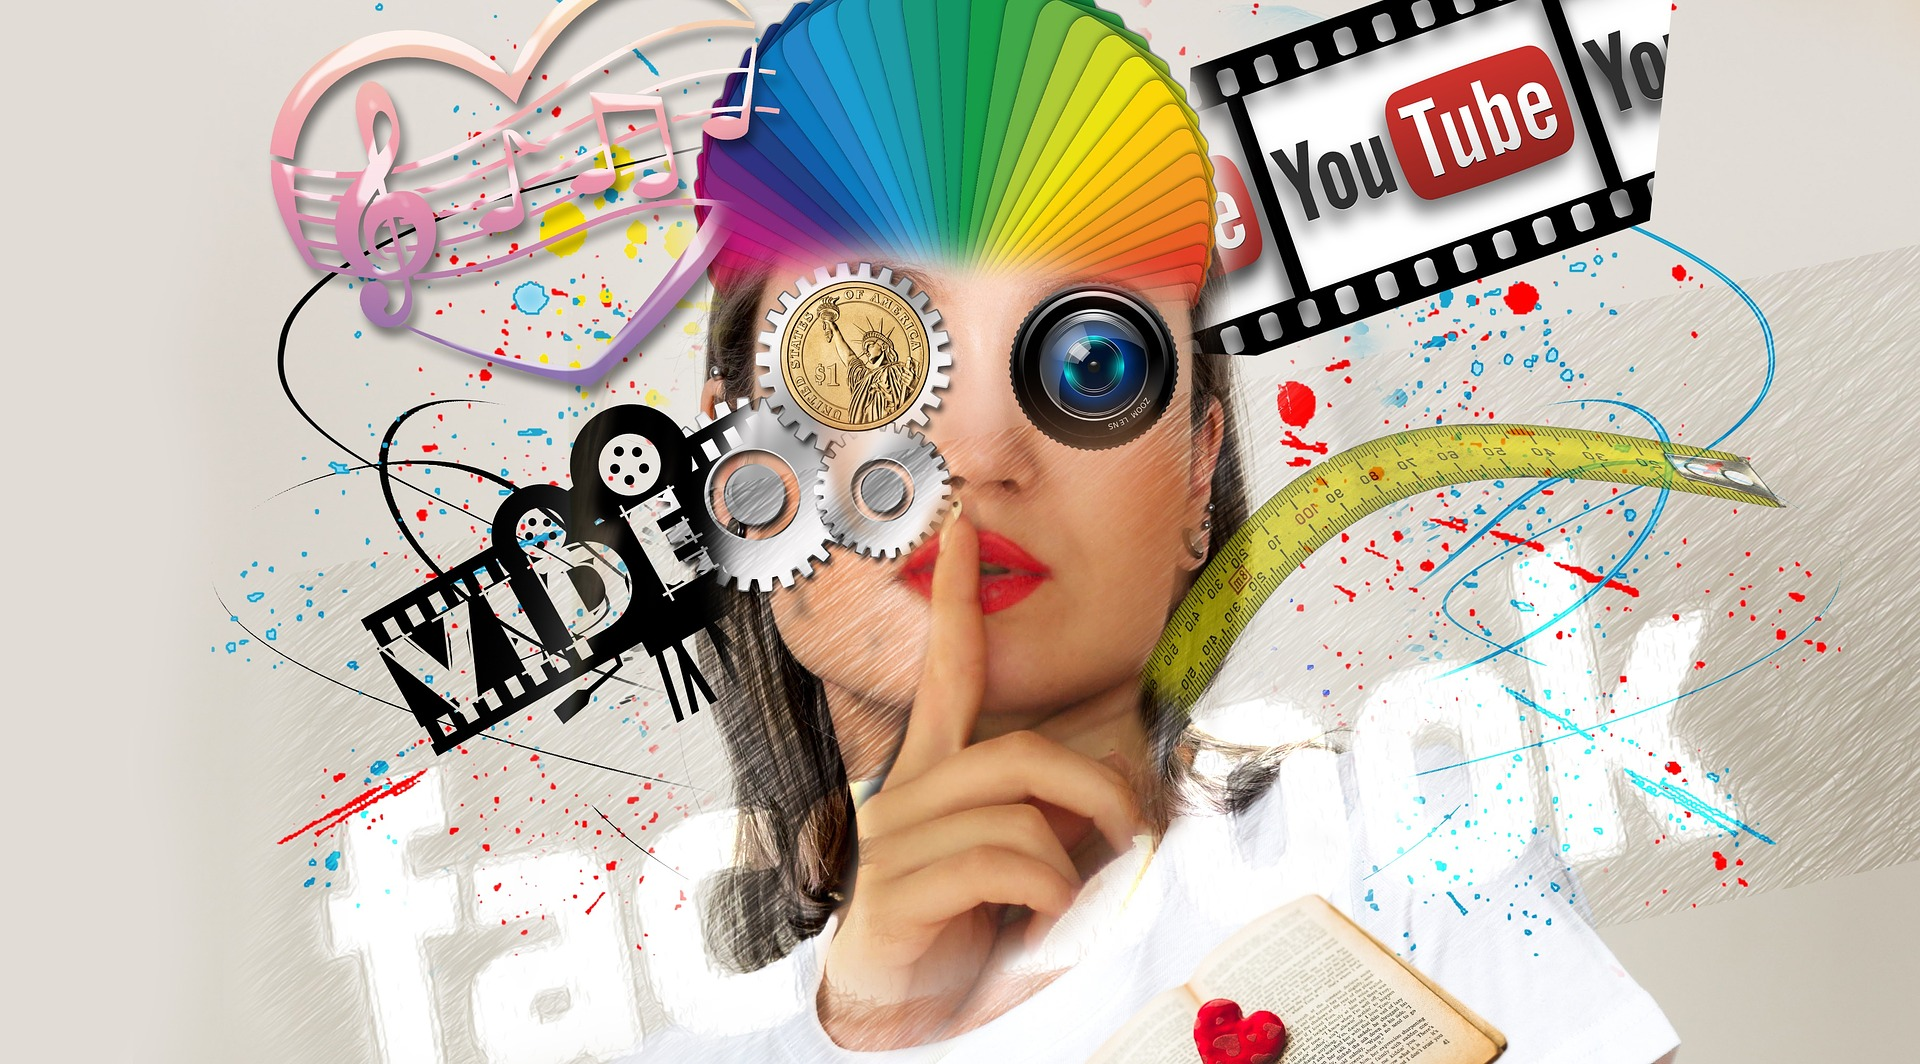 Branding: How to build brand awareness